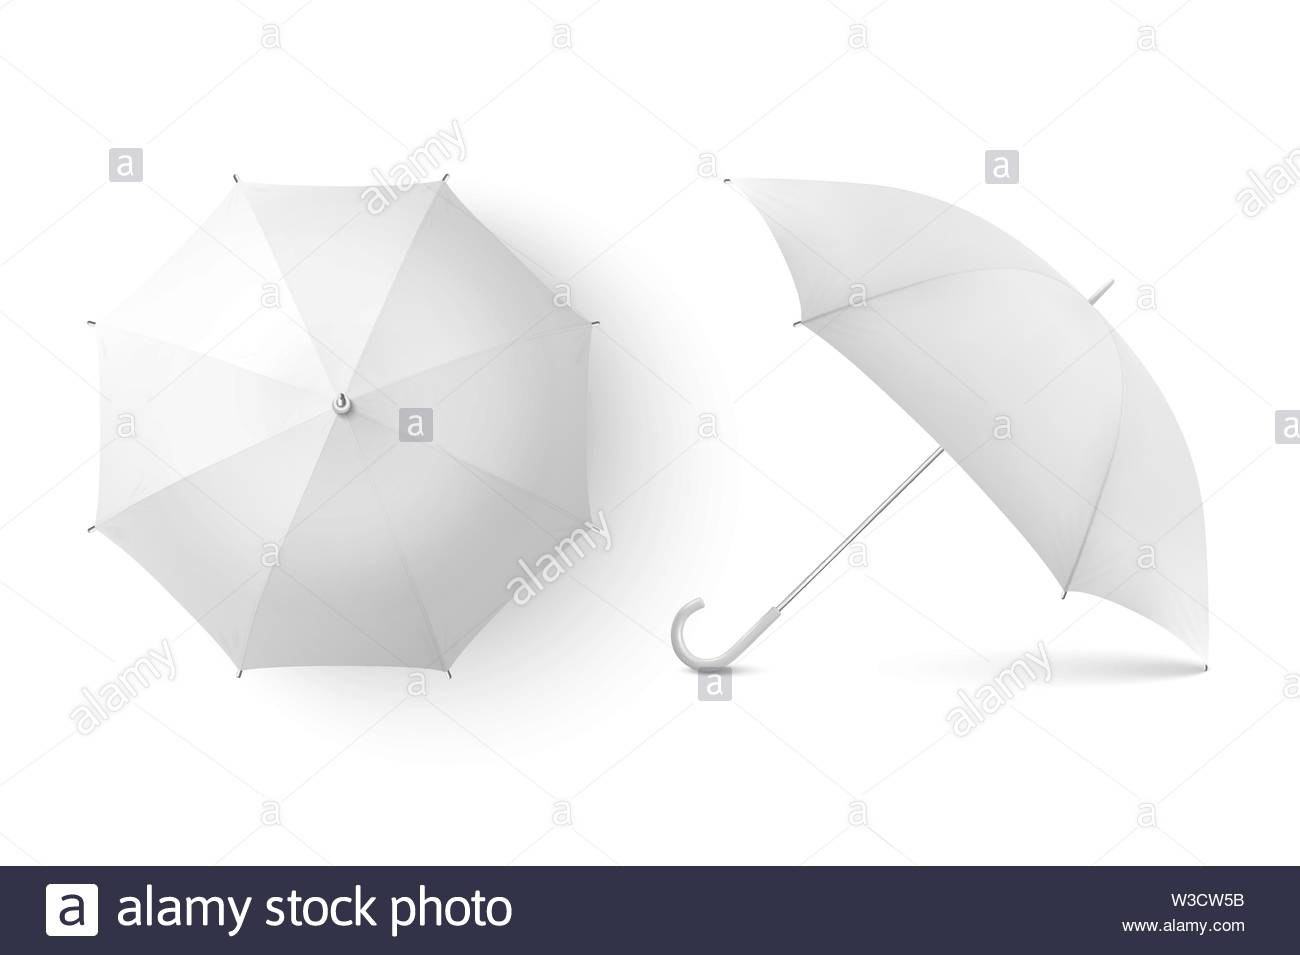 Vector D Realistic Render White Blank Umbrella Icon Set Closeup Throughout Blank Umbrella Template